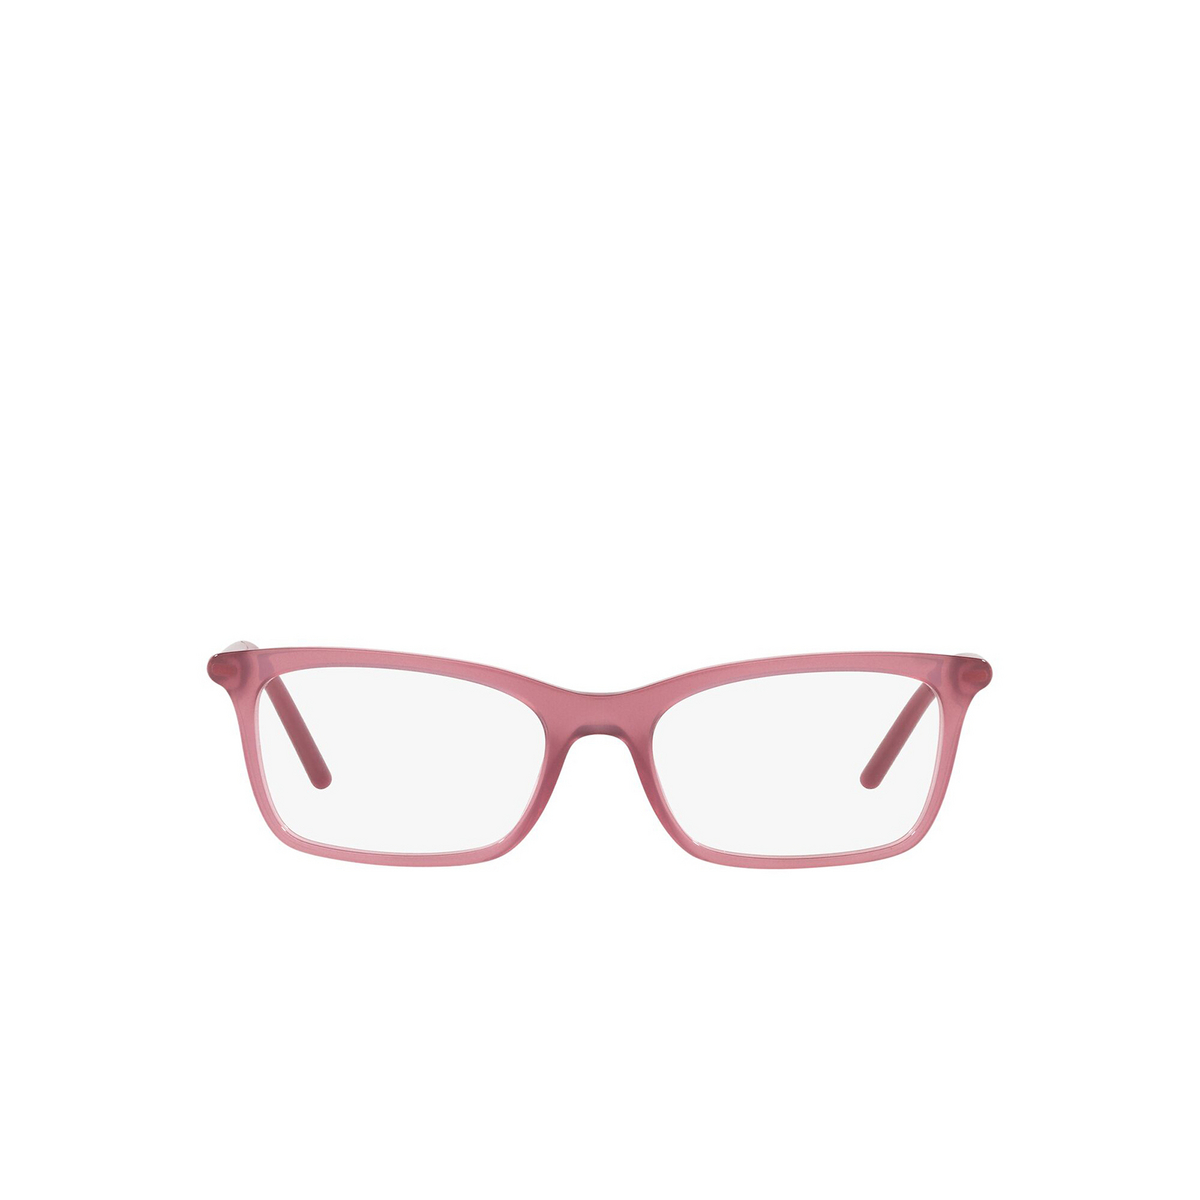 Prada® Rectangle Eyeglasses: PR 16WV color Opal Bordeaux 2BM1O1 - front view.